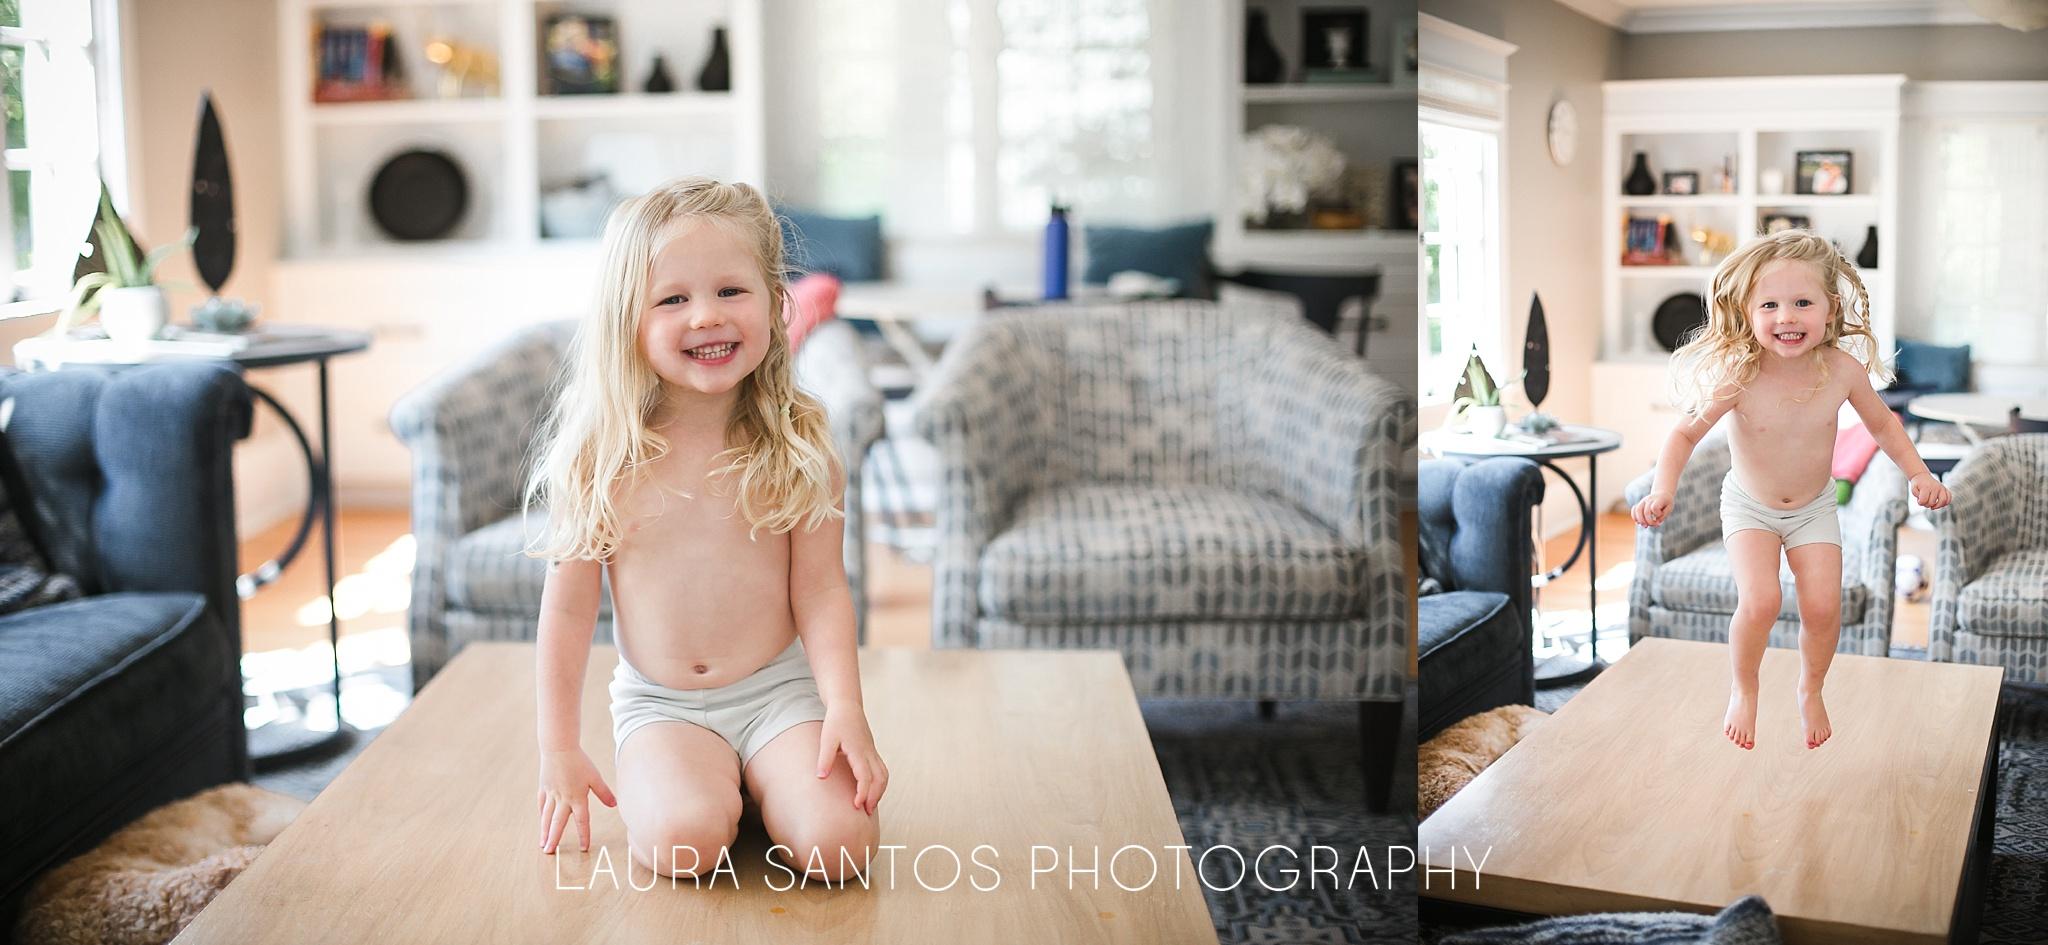 Laura Santos Photography Portland Oregon Family Photographer_0264.jpg